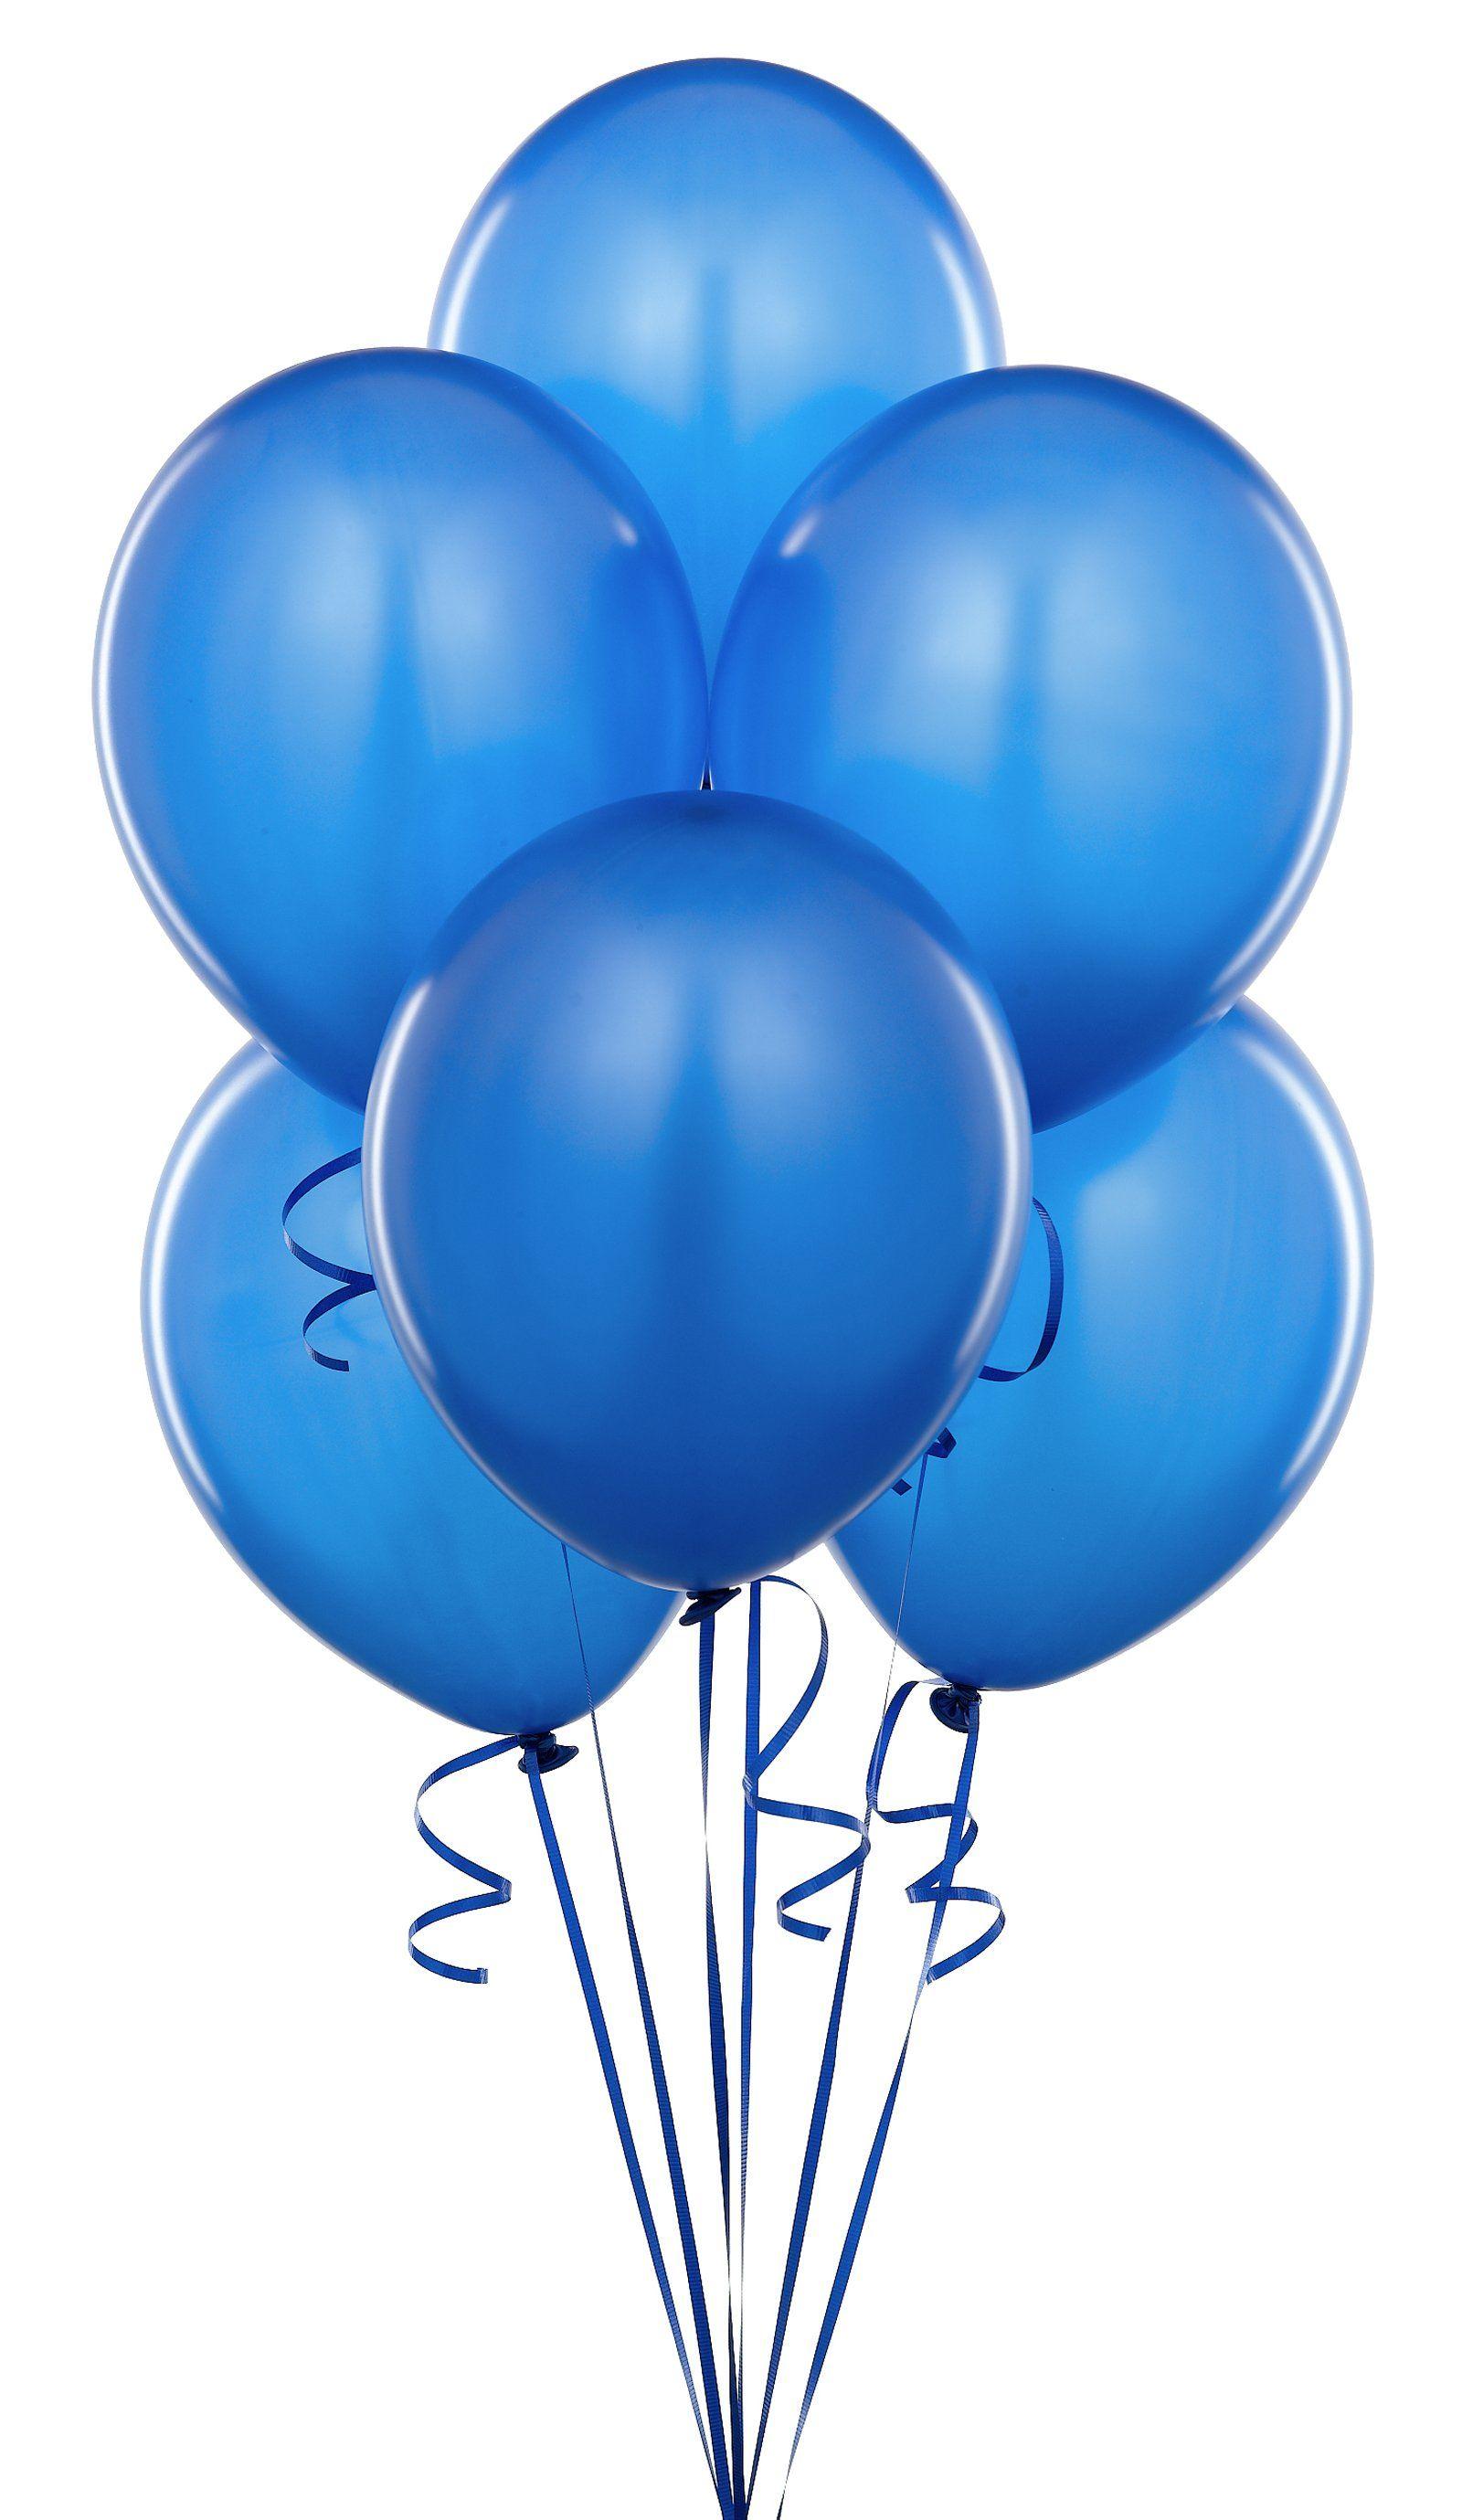 Green and blue balloons - Batman Happy Birthday Foil Balloon